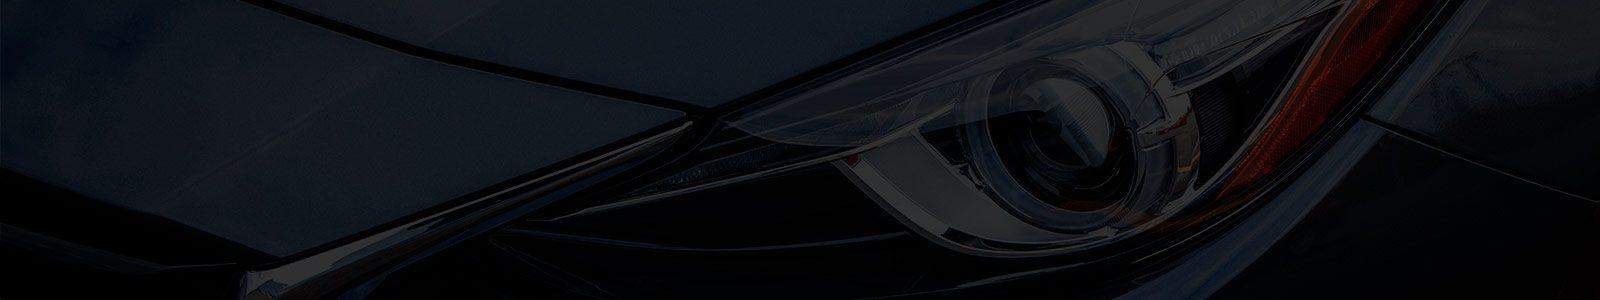 obes-quality-headlight